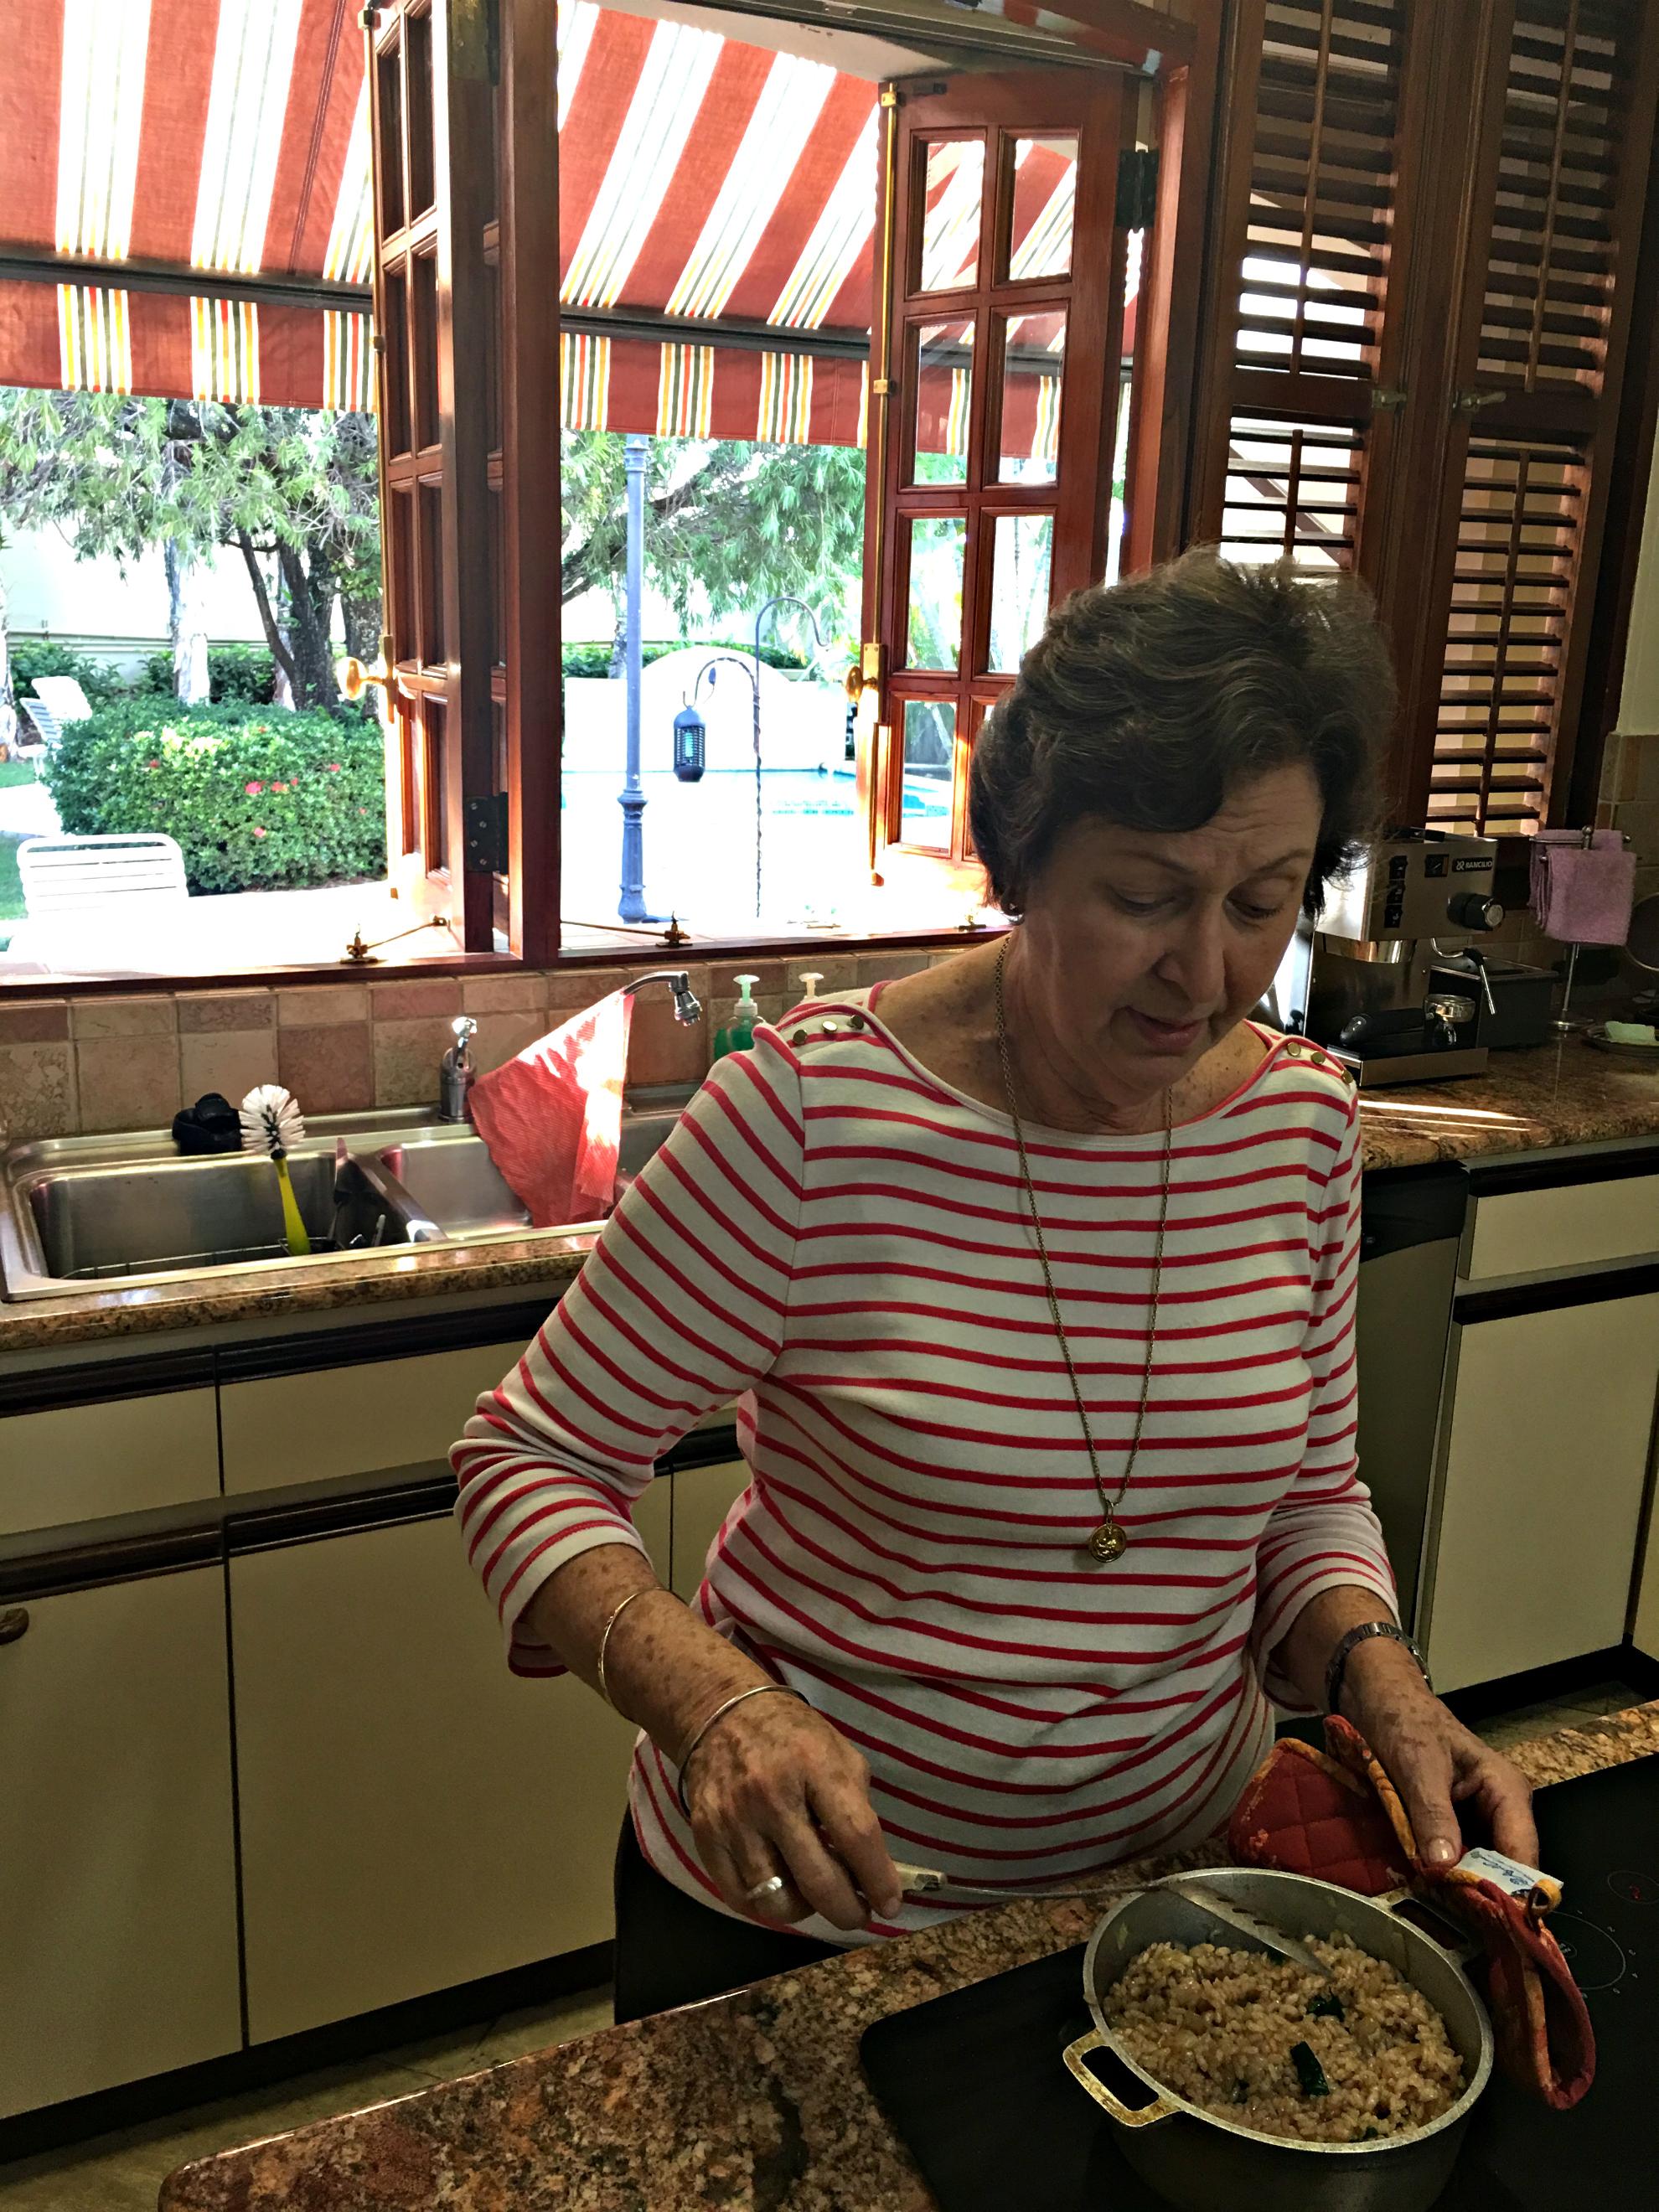 Aita making arroz